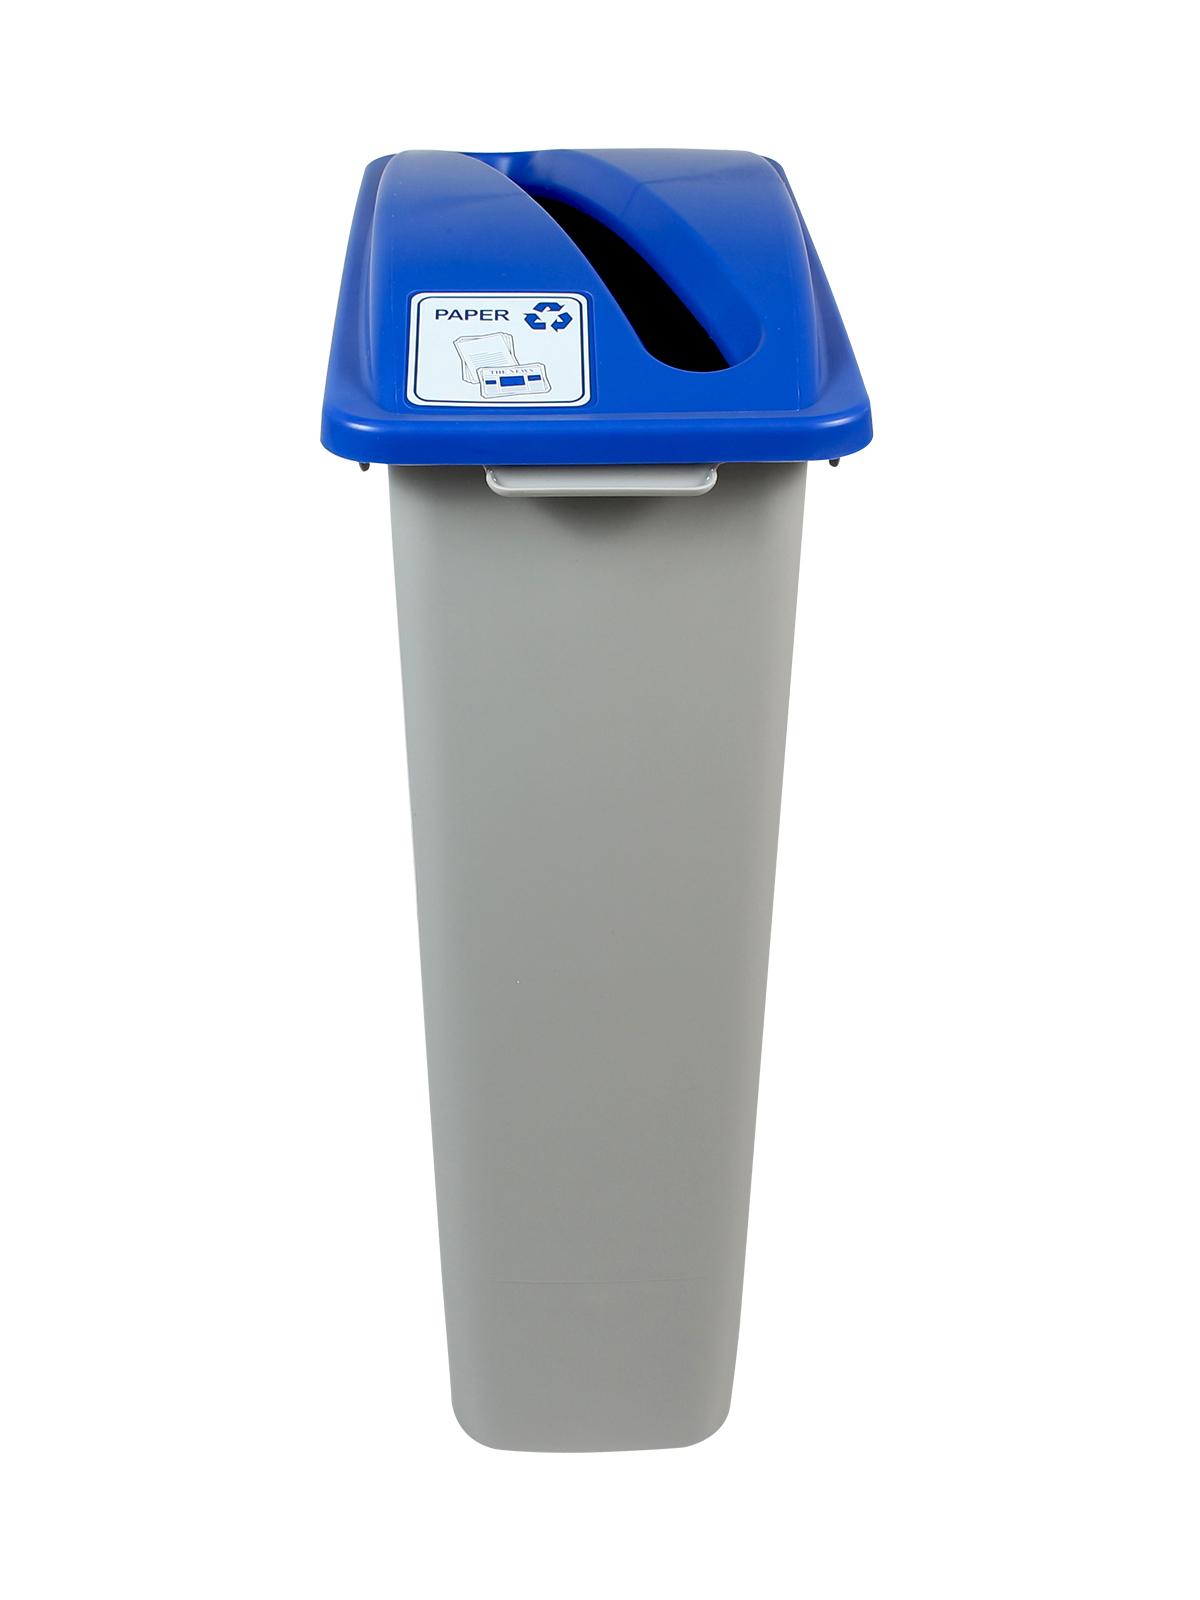 WASTE WATCHER - Single - Paper - Slot - Grey-Blue